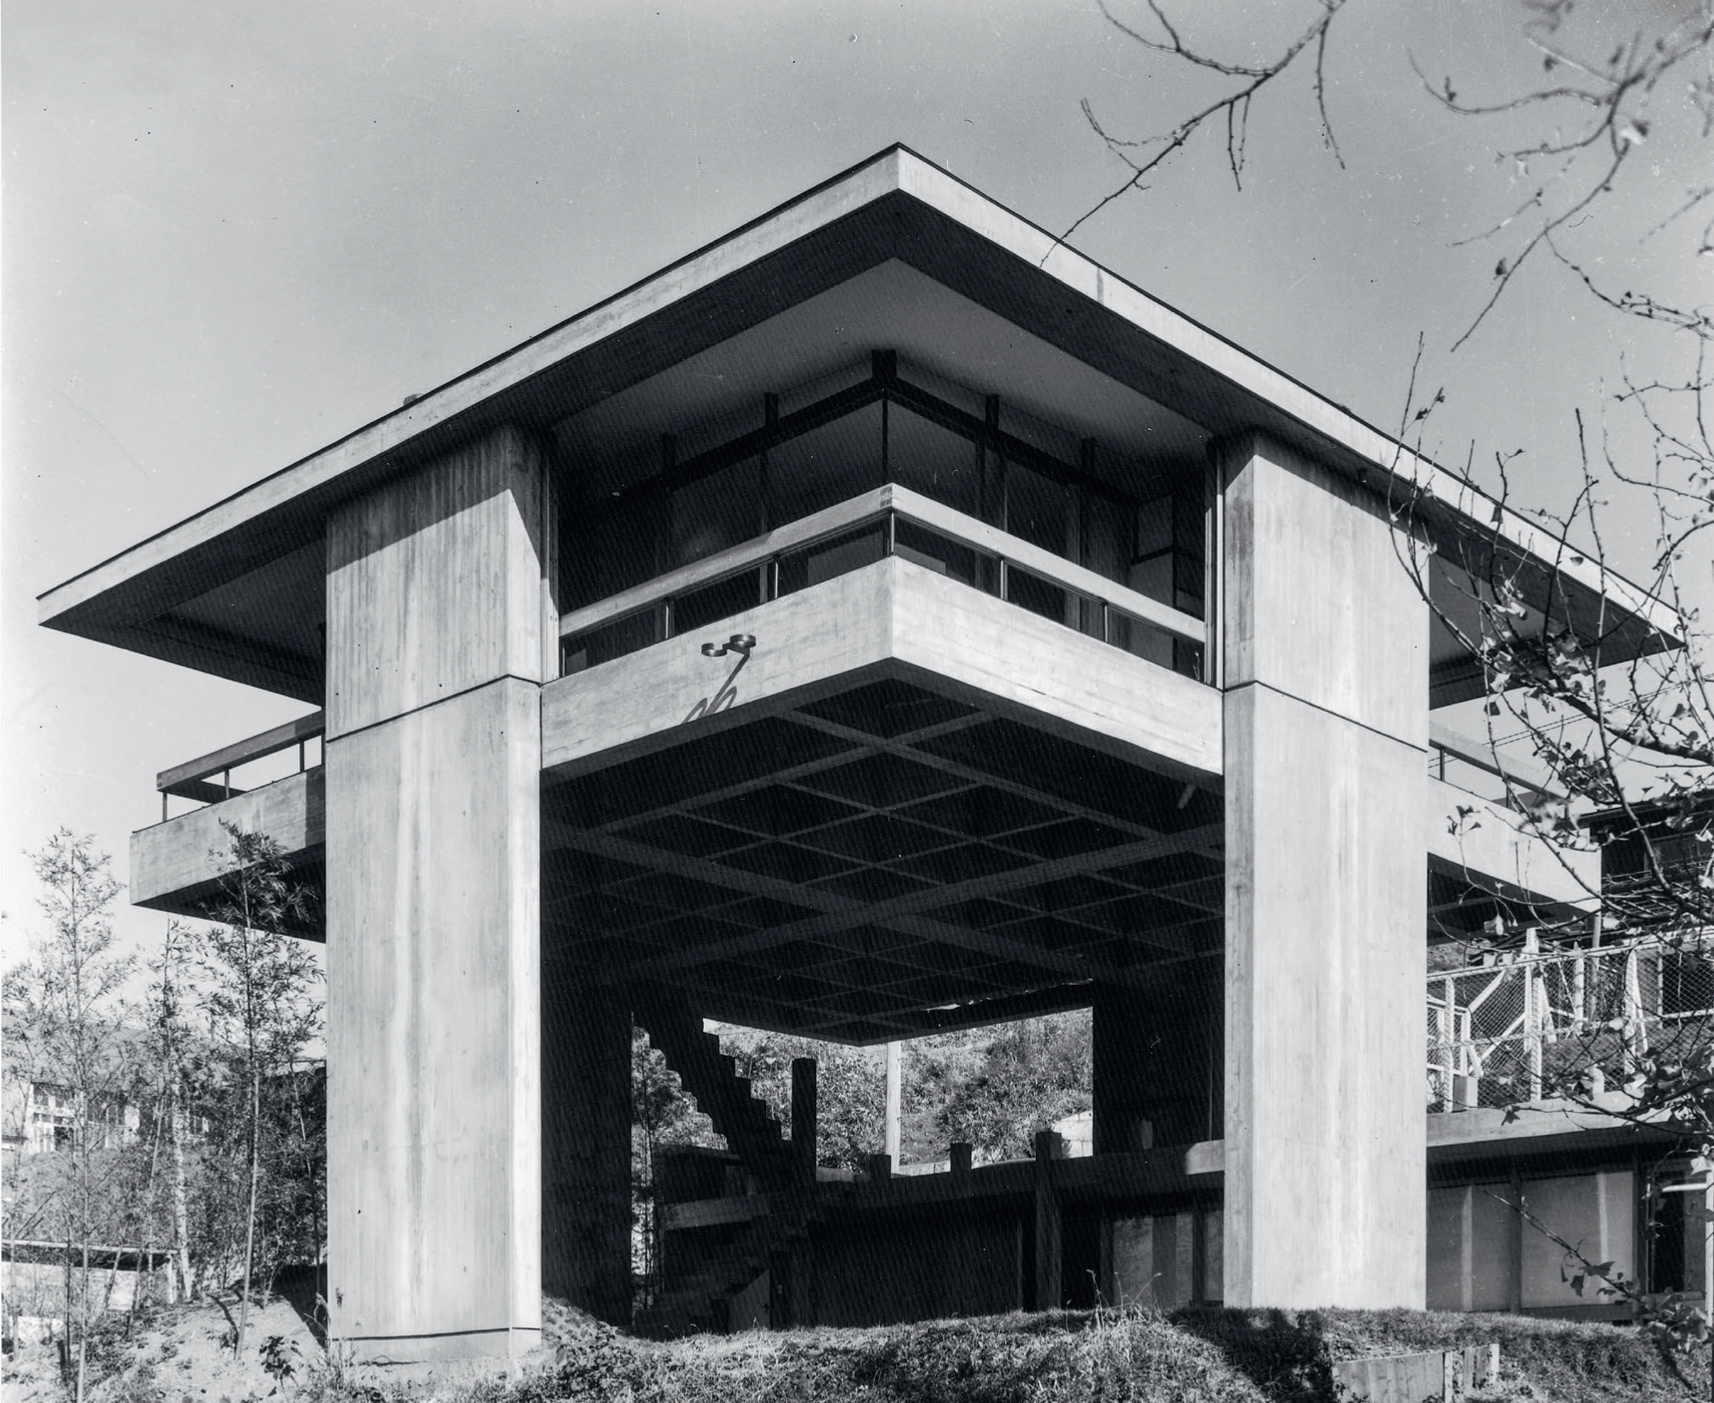 (Project Japan pg. 138)  Kikutake's Sky House